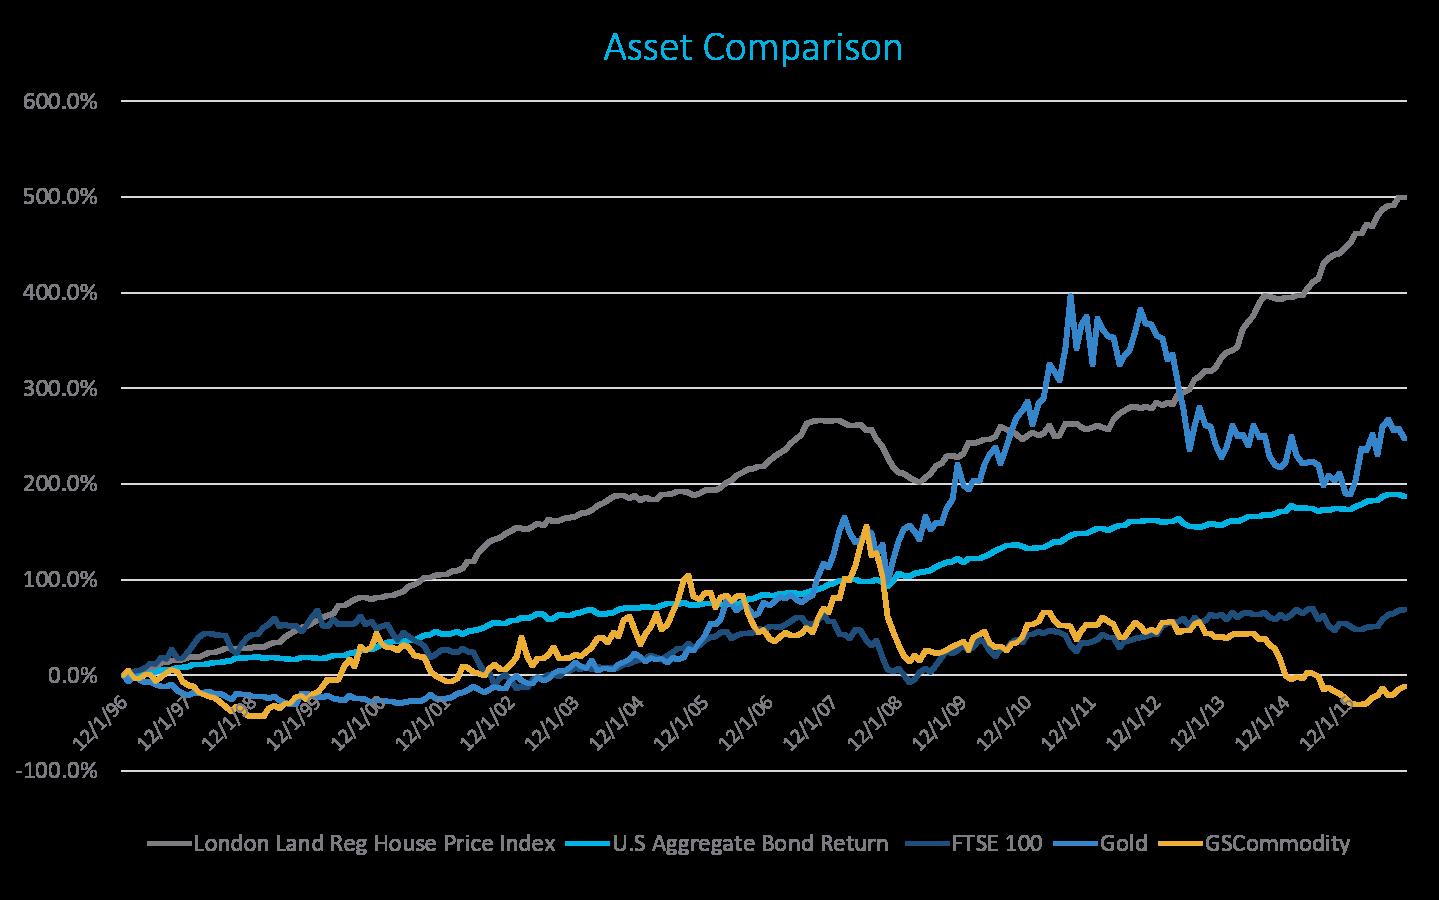 Asset Comparsion Table